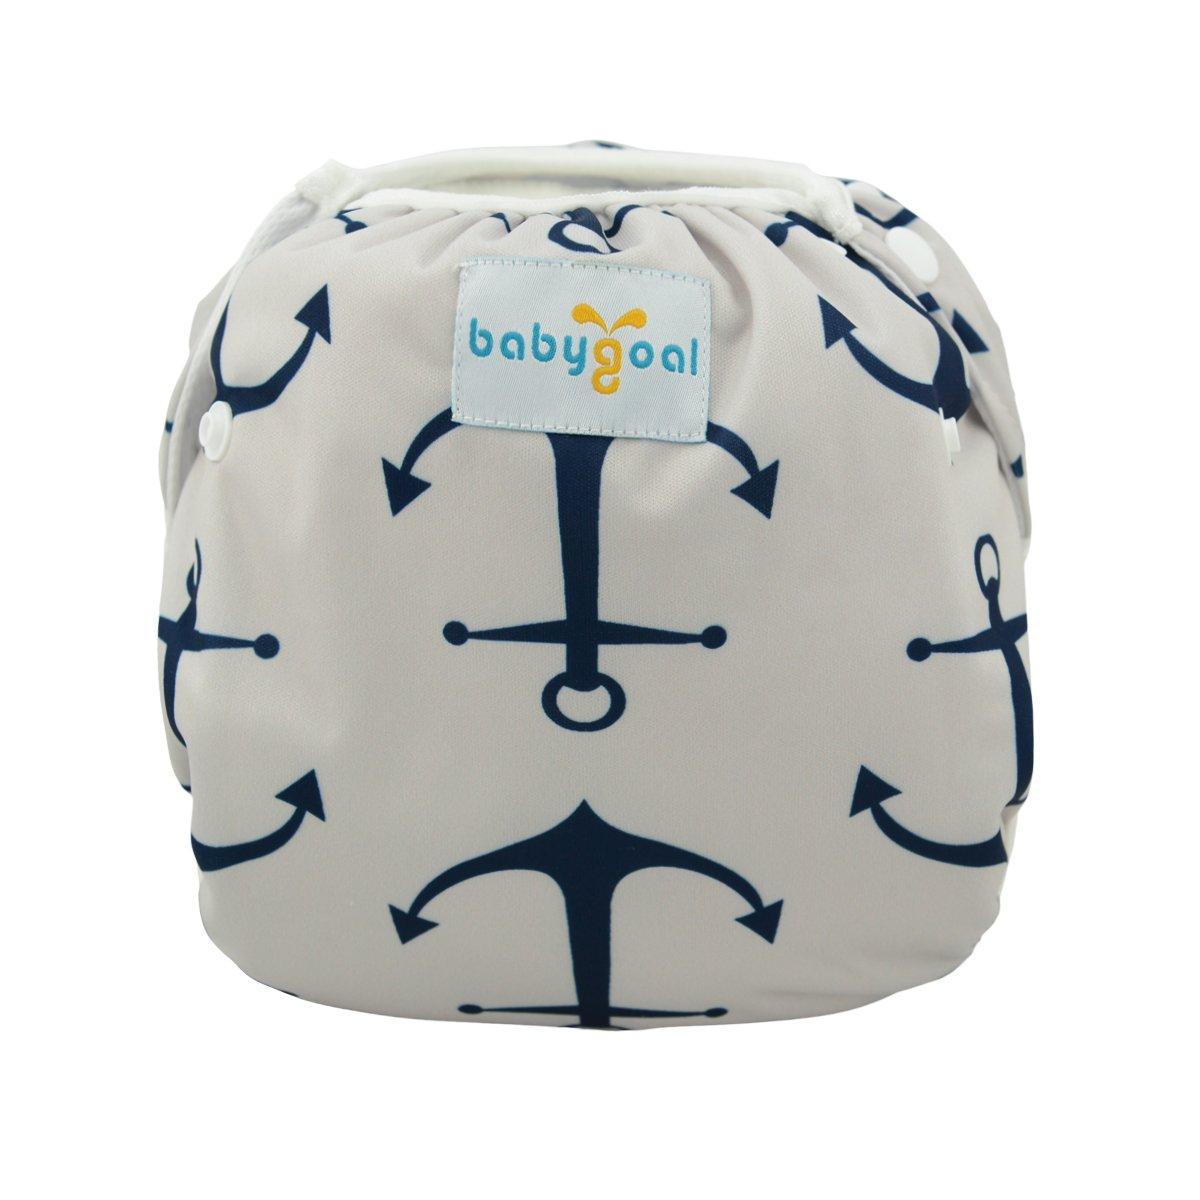 babygoal Reusable Swim Diaper, Washable Swimsuits